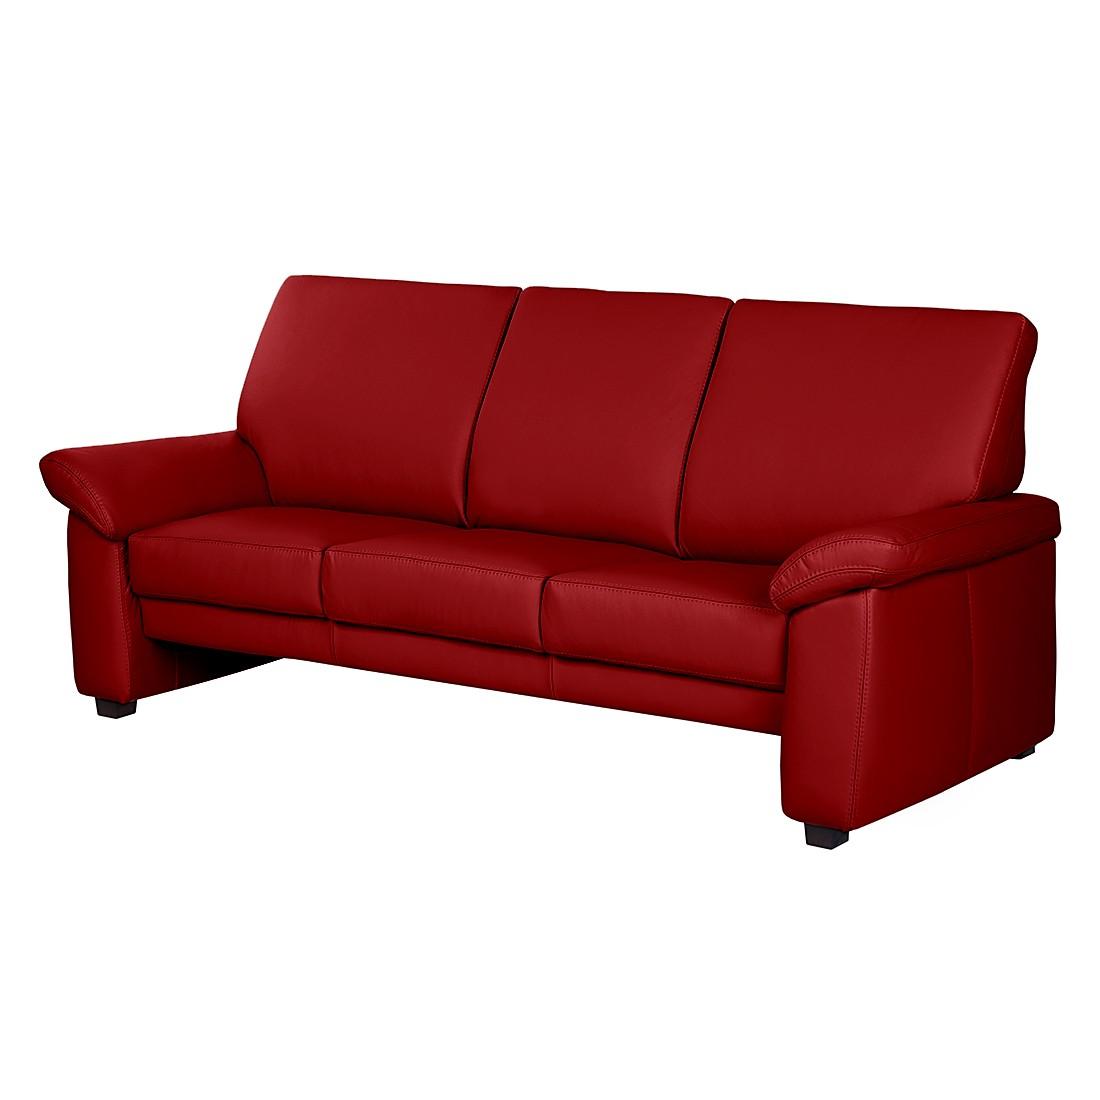 Sofa Grimsby (3-Sitzer) - Echtleder - Rot, Nuovoform